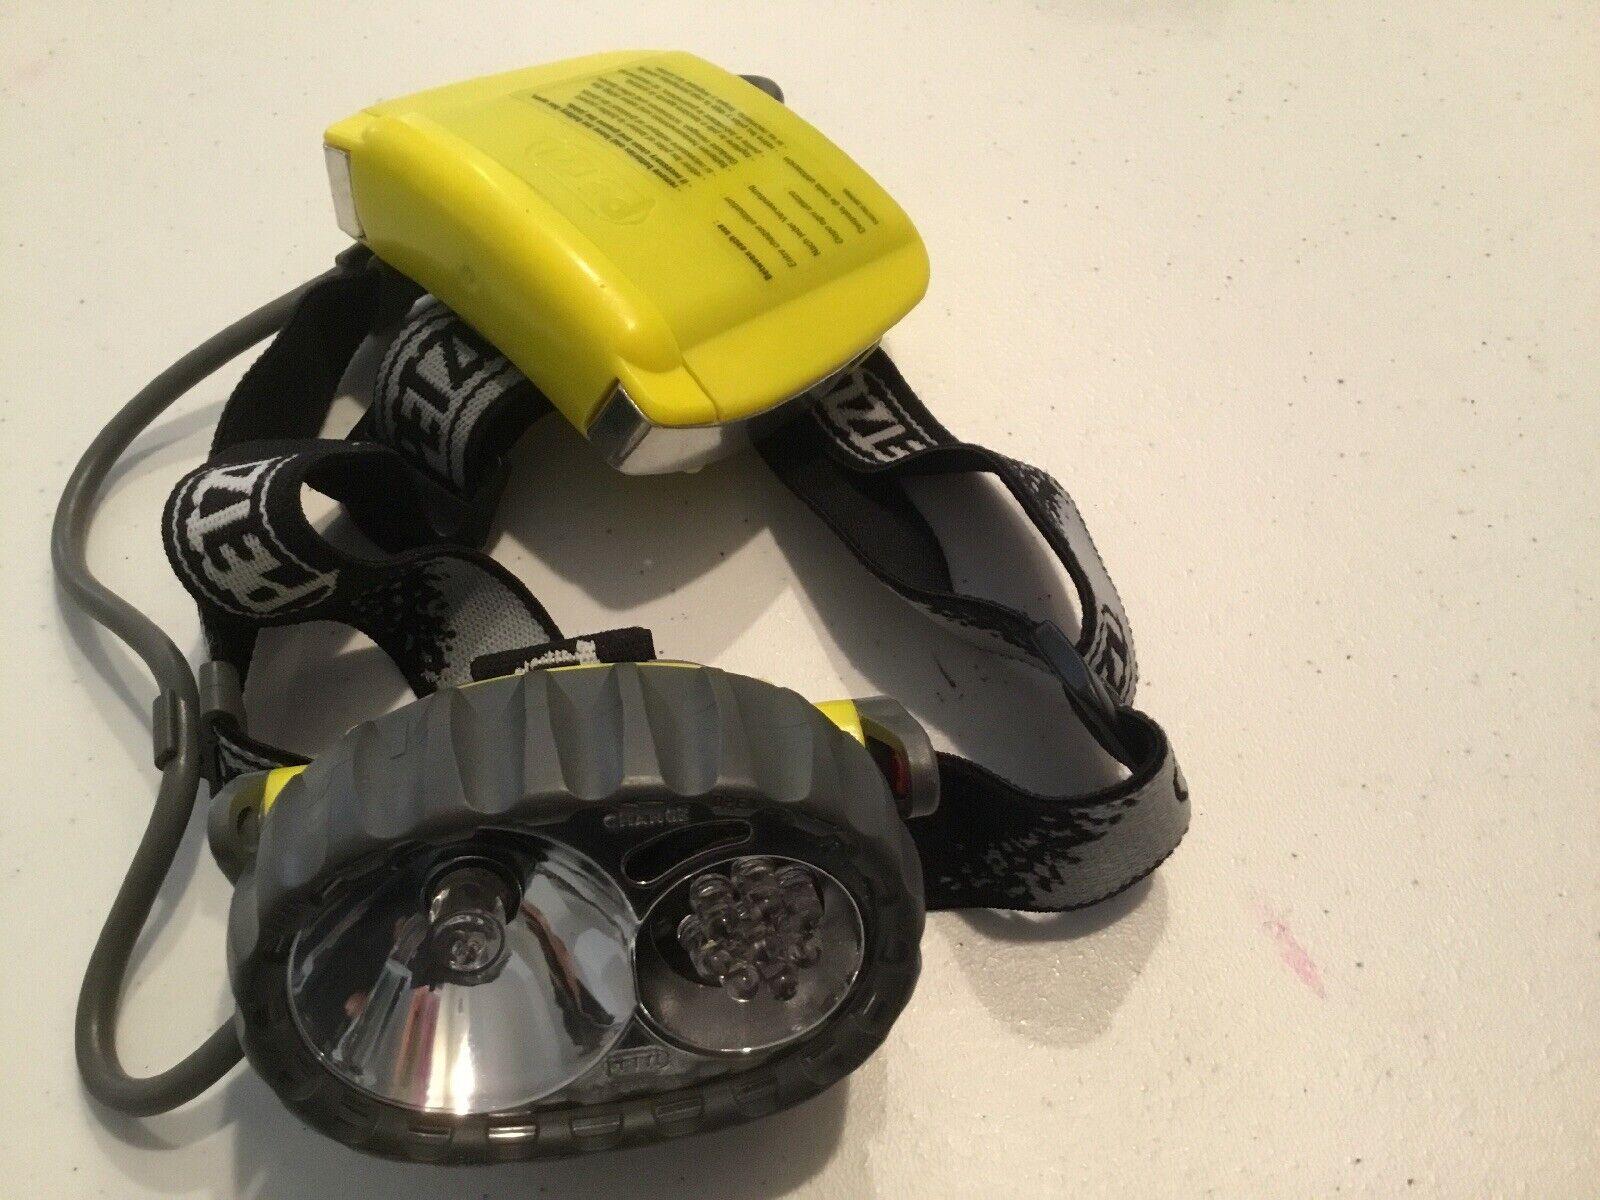 Petzl Duo LED 5 Taschenlampe